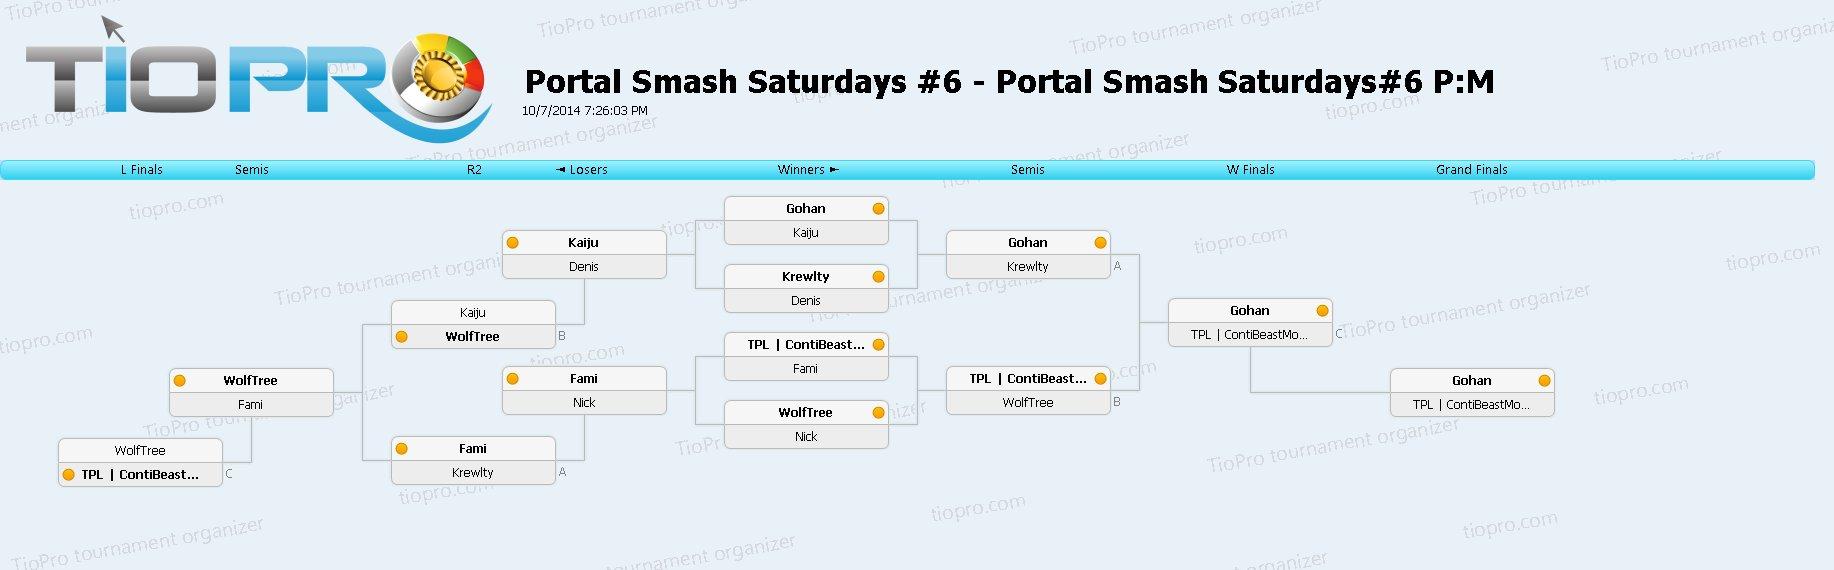 Portal Smash Saturdays#6 P:M